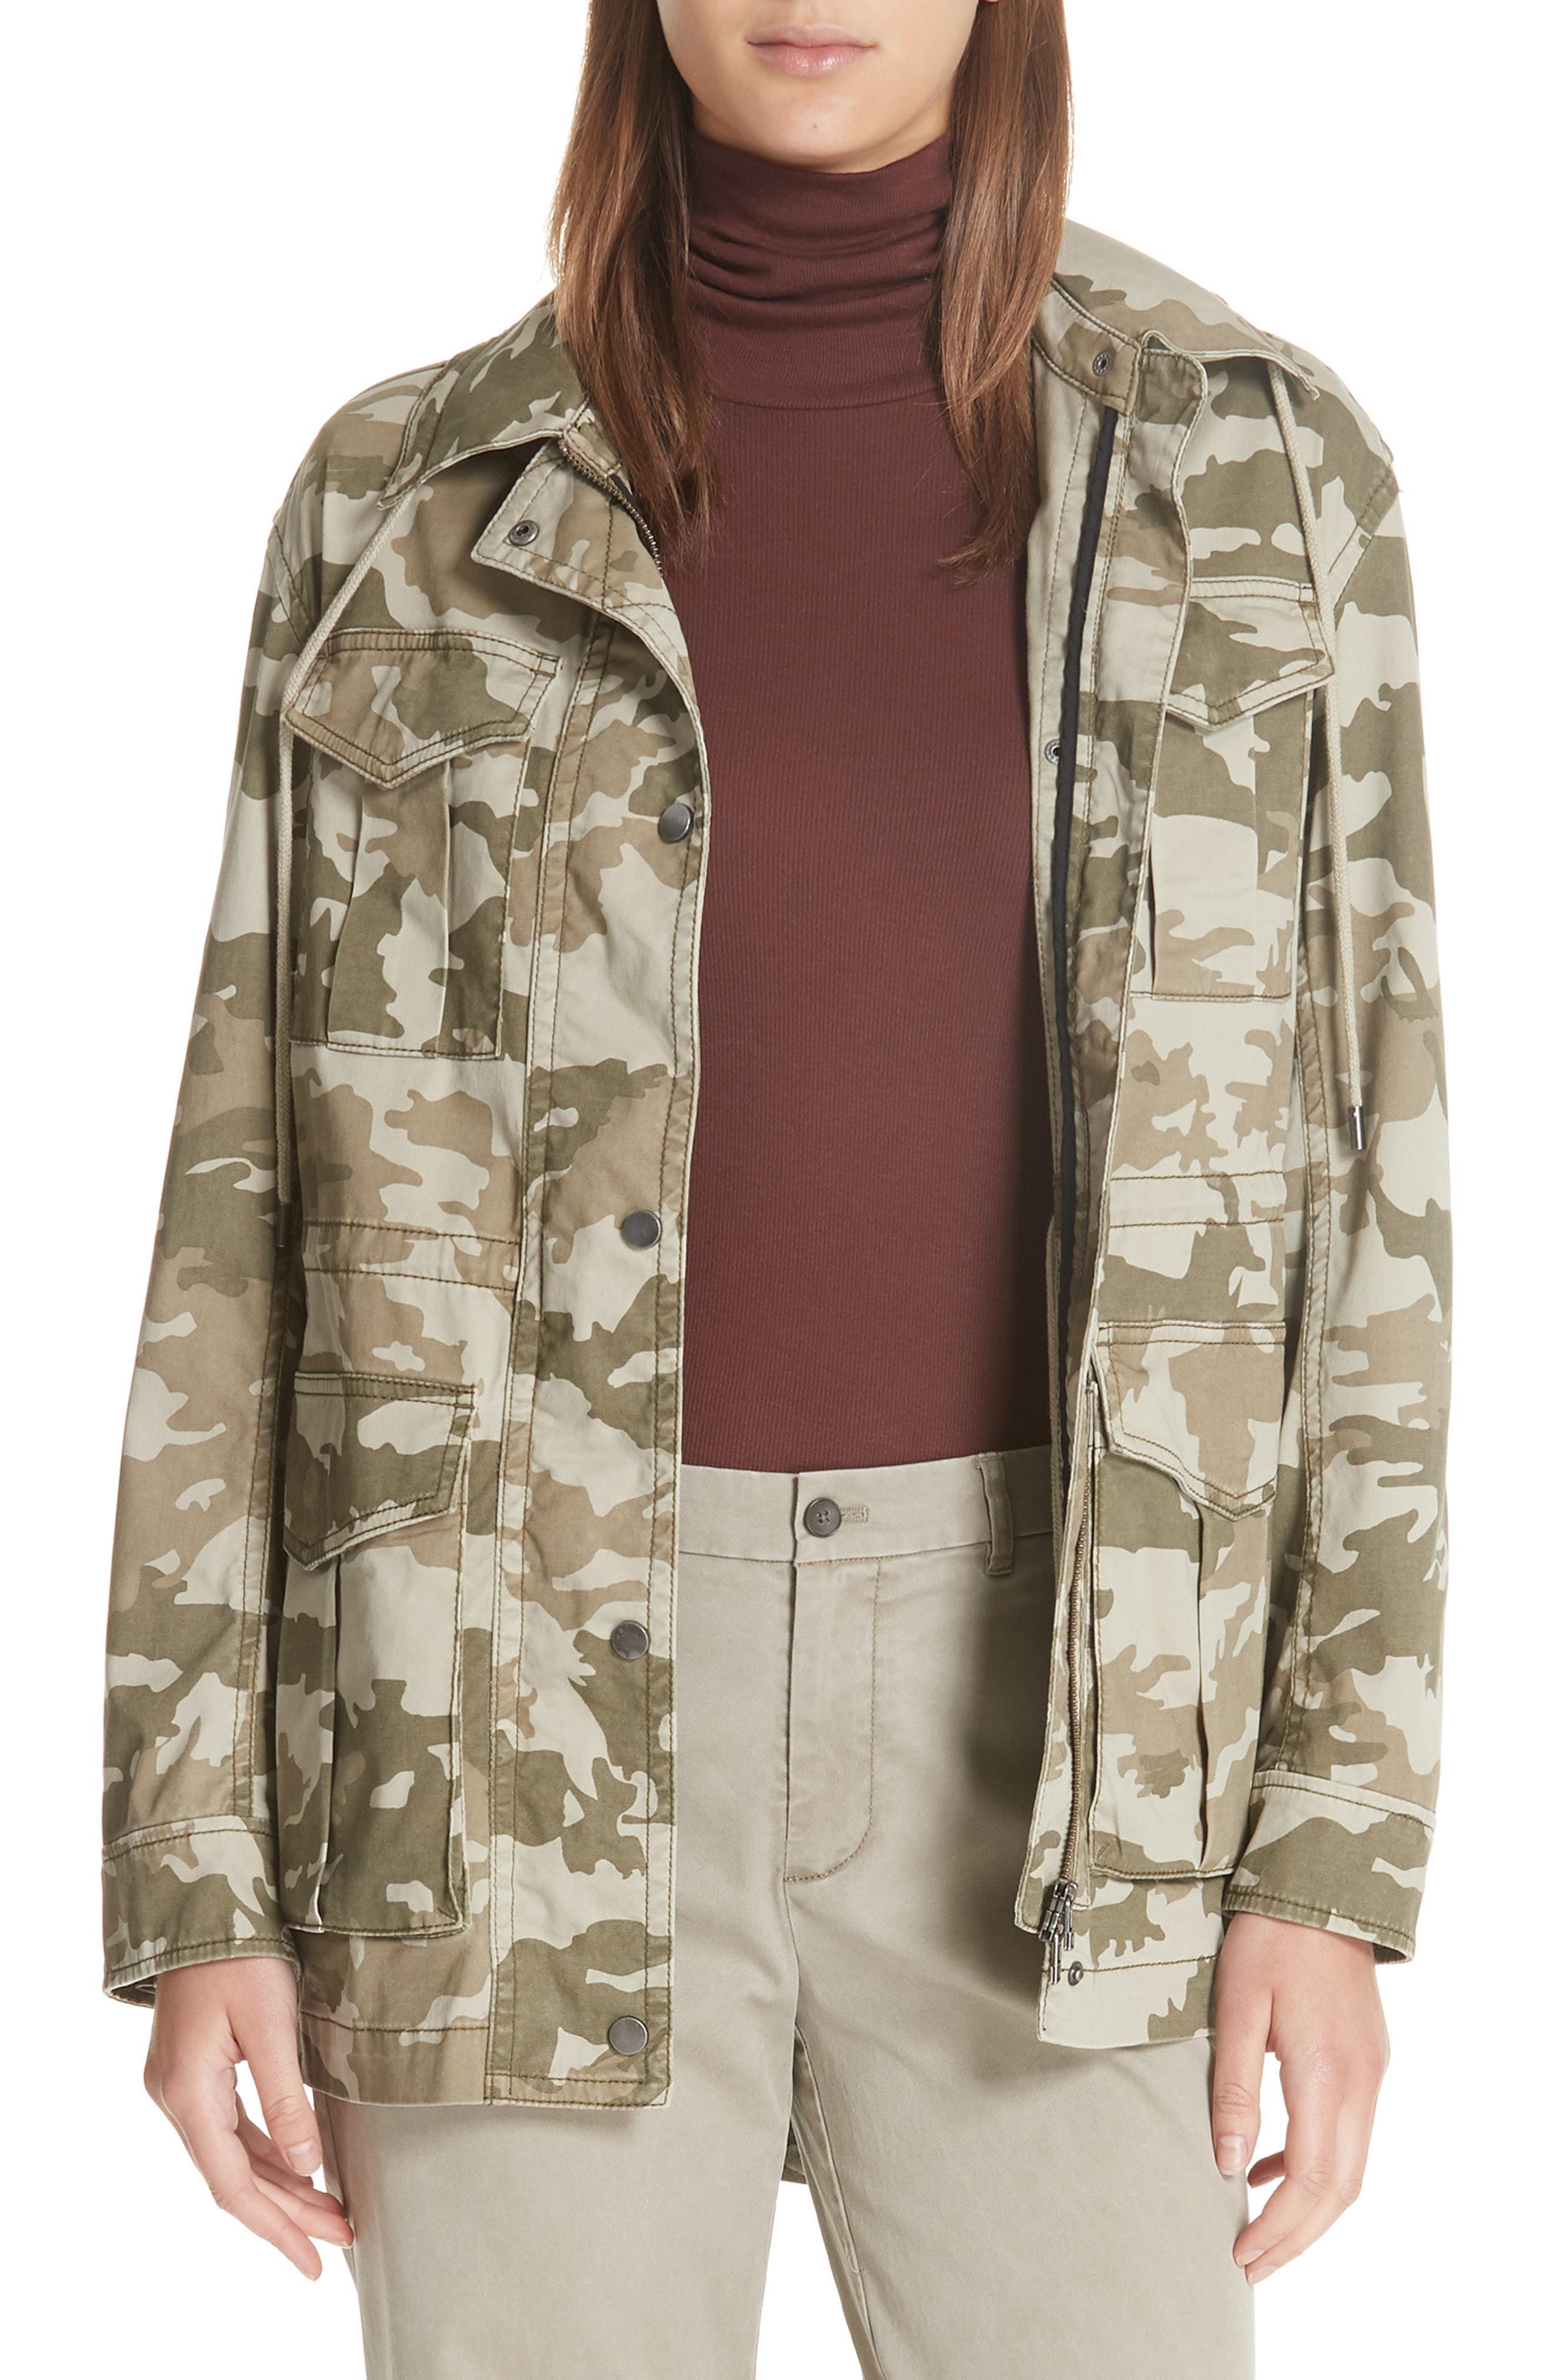 1f5f584a0796c Lyst - ATM Camo Stretch Cotton Field Jacket